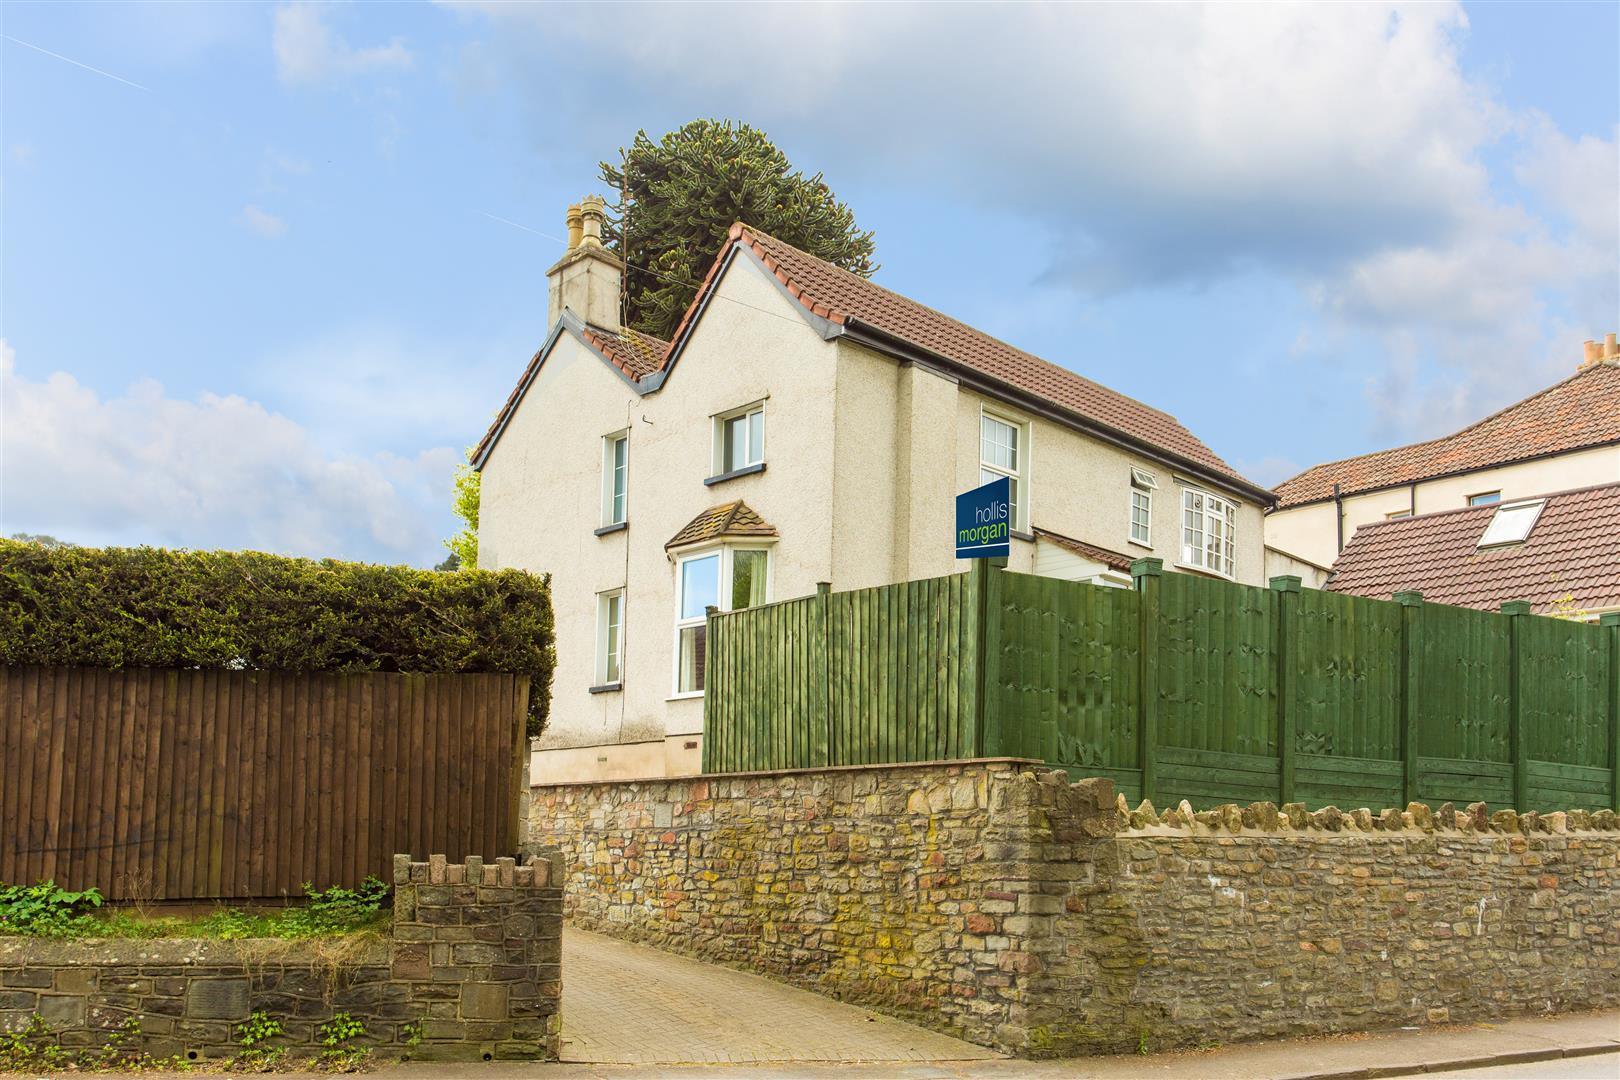 4 Bedrooms House for sale in Park Road, Stapleton Village